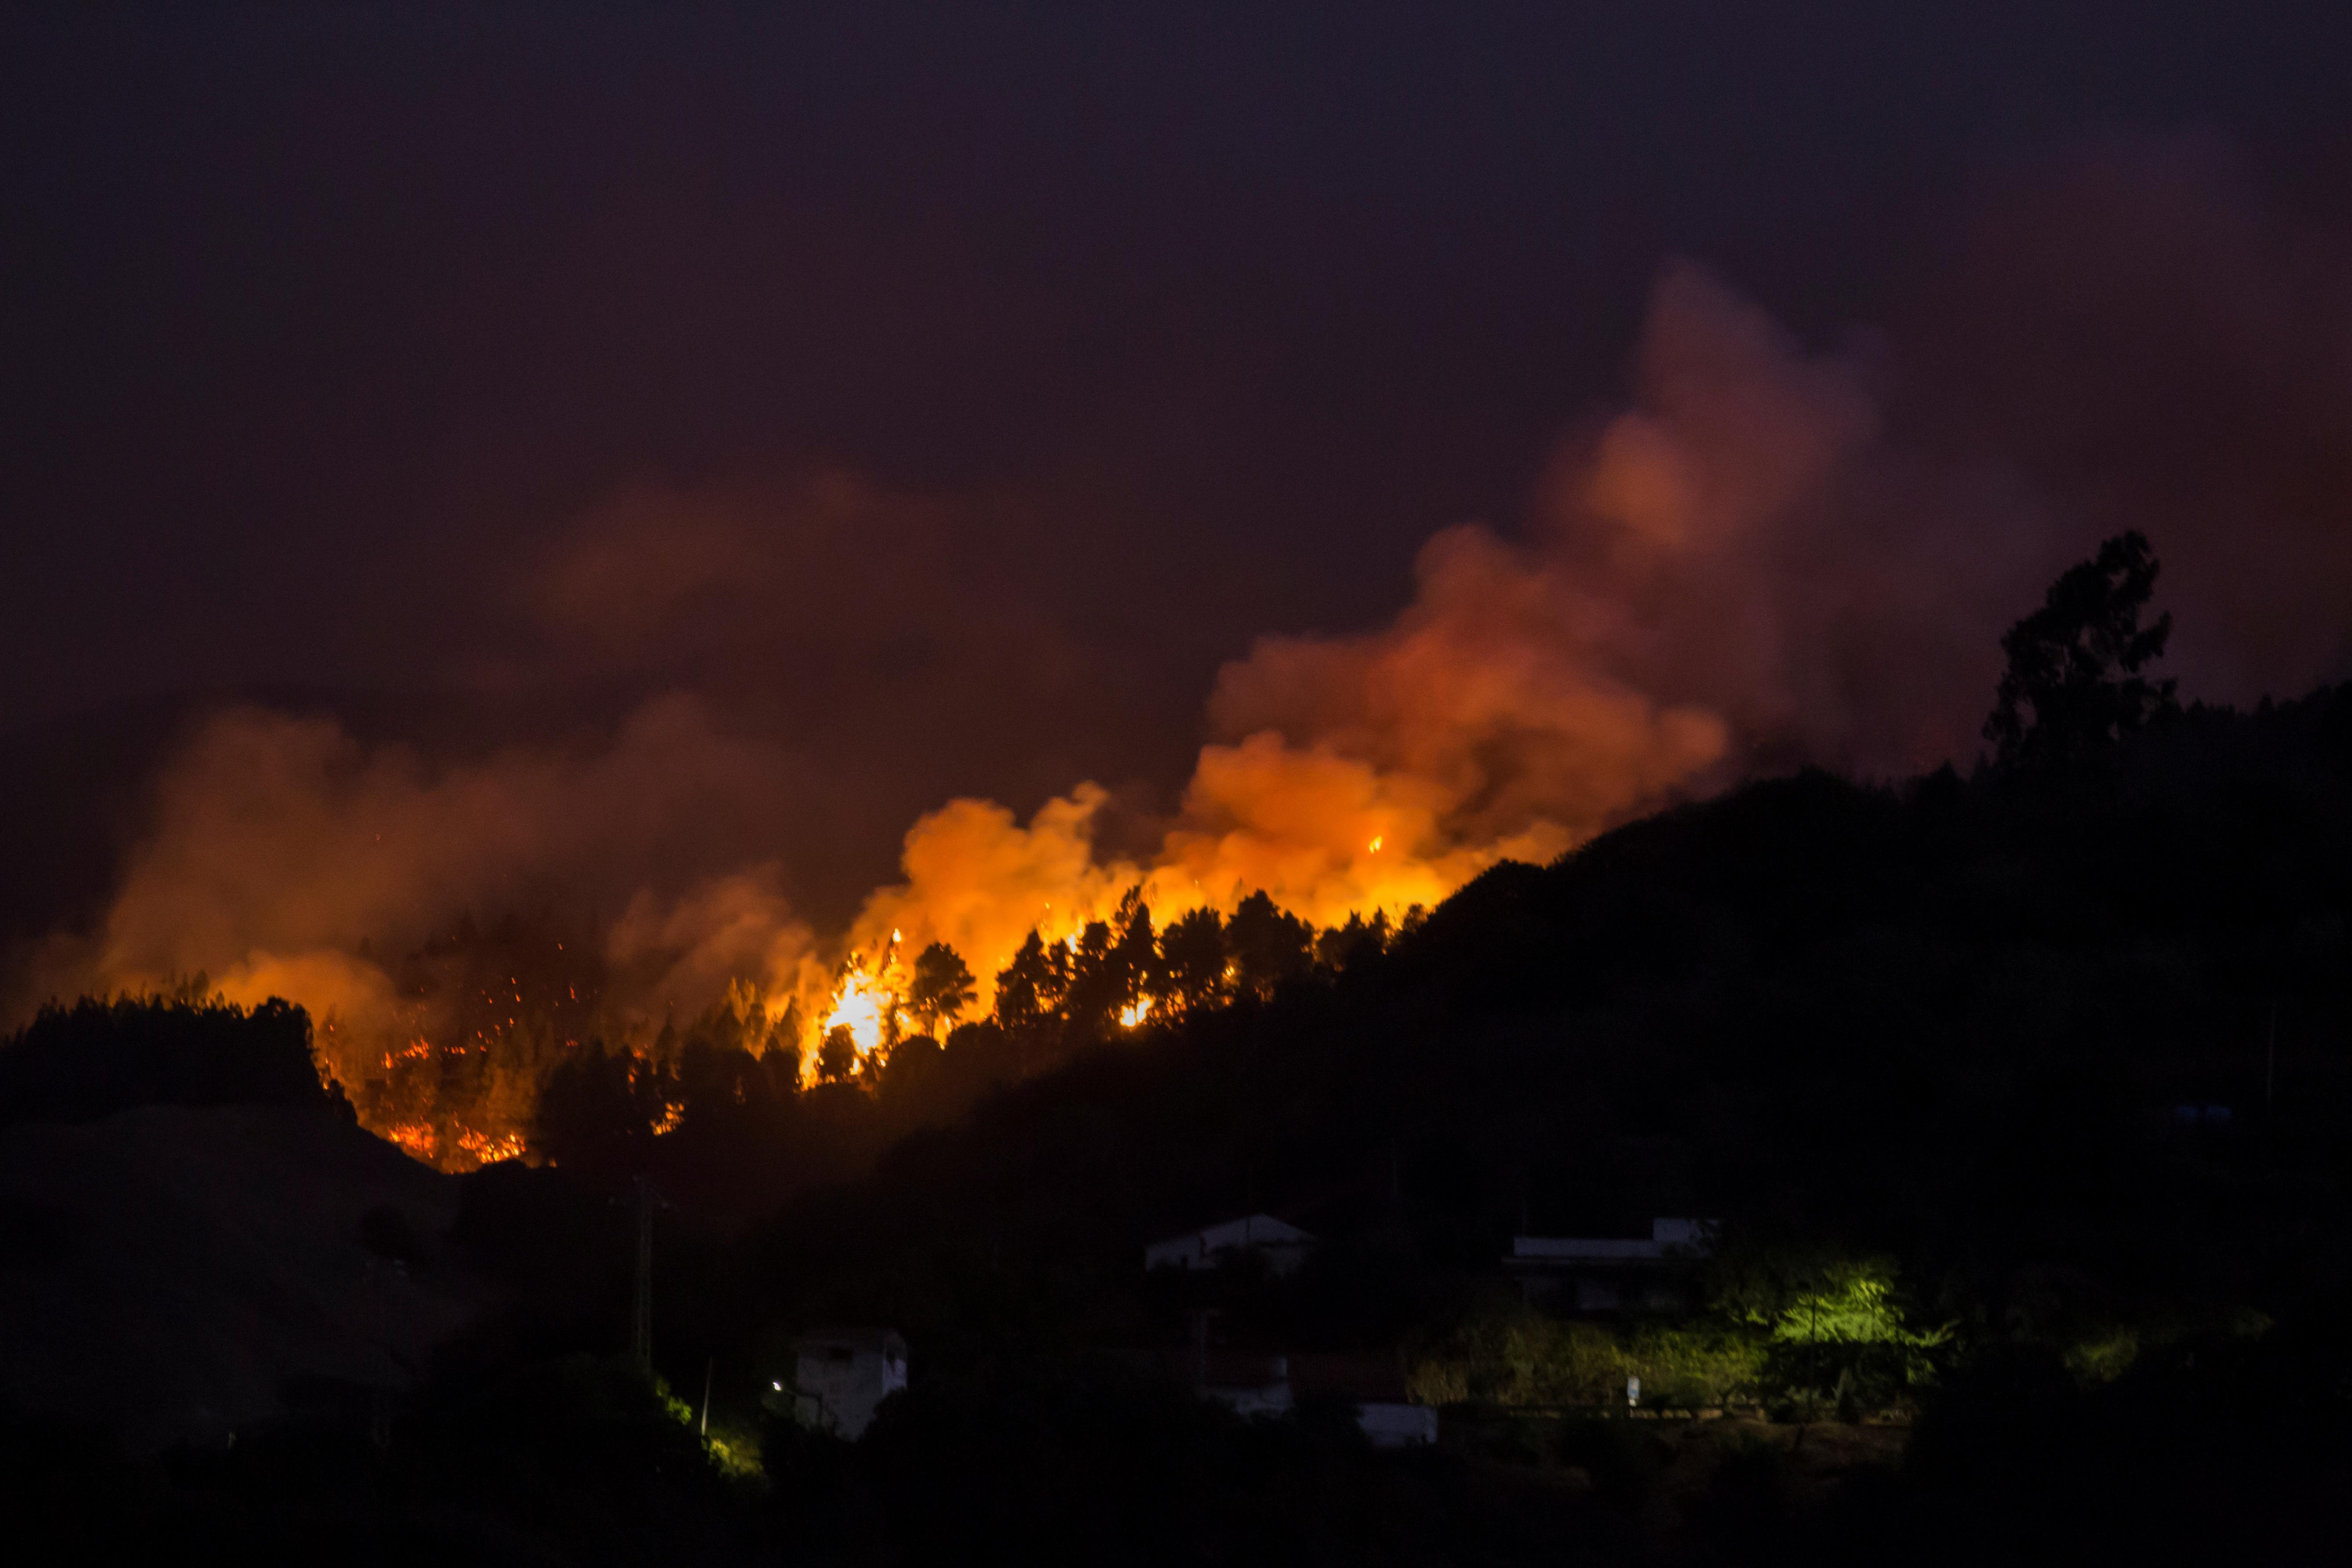 Canary Islands authorities evacuate 4,000 as wildfire spreads